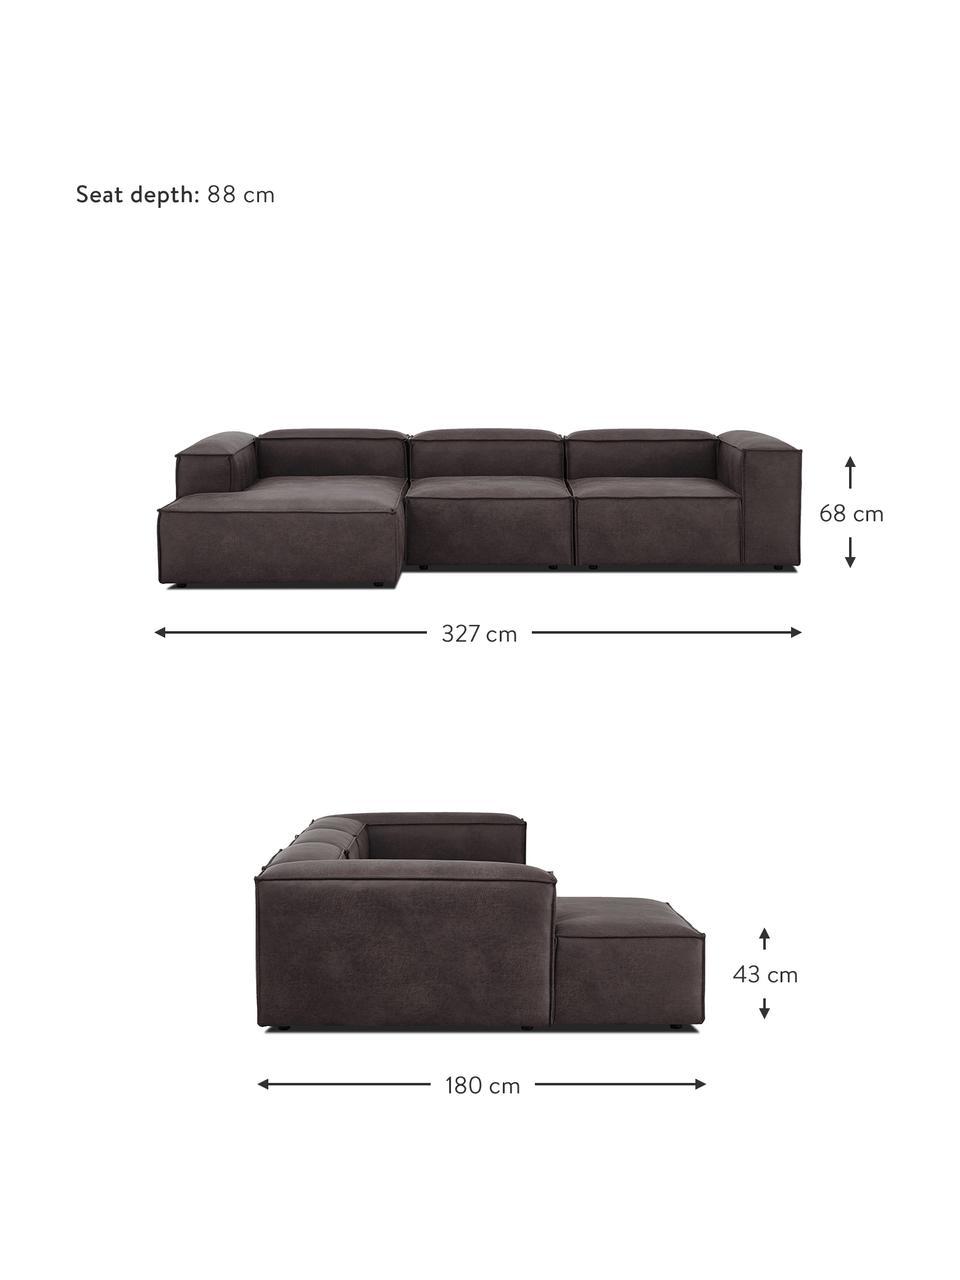 Canapé modulable en cuir recyclé brun-gris Lennon, Cuir brun-gris